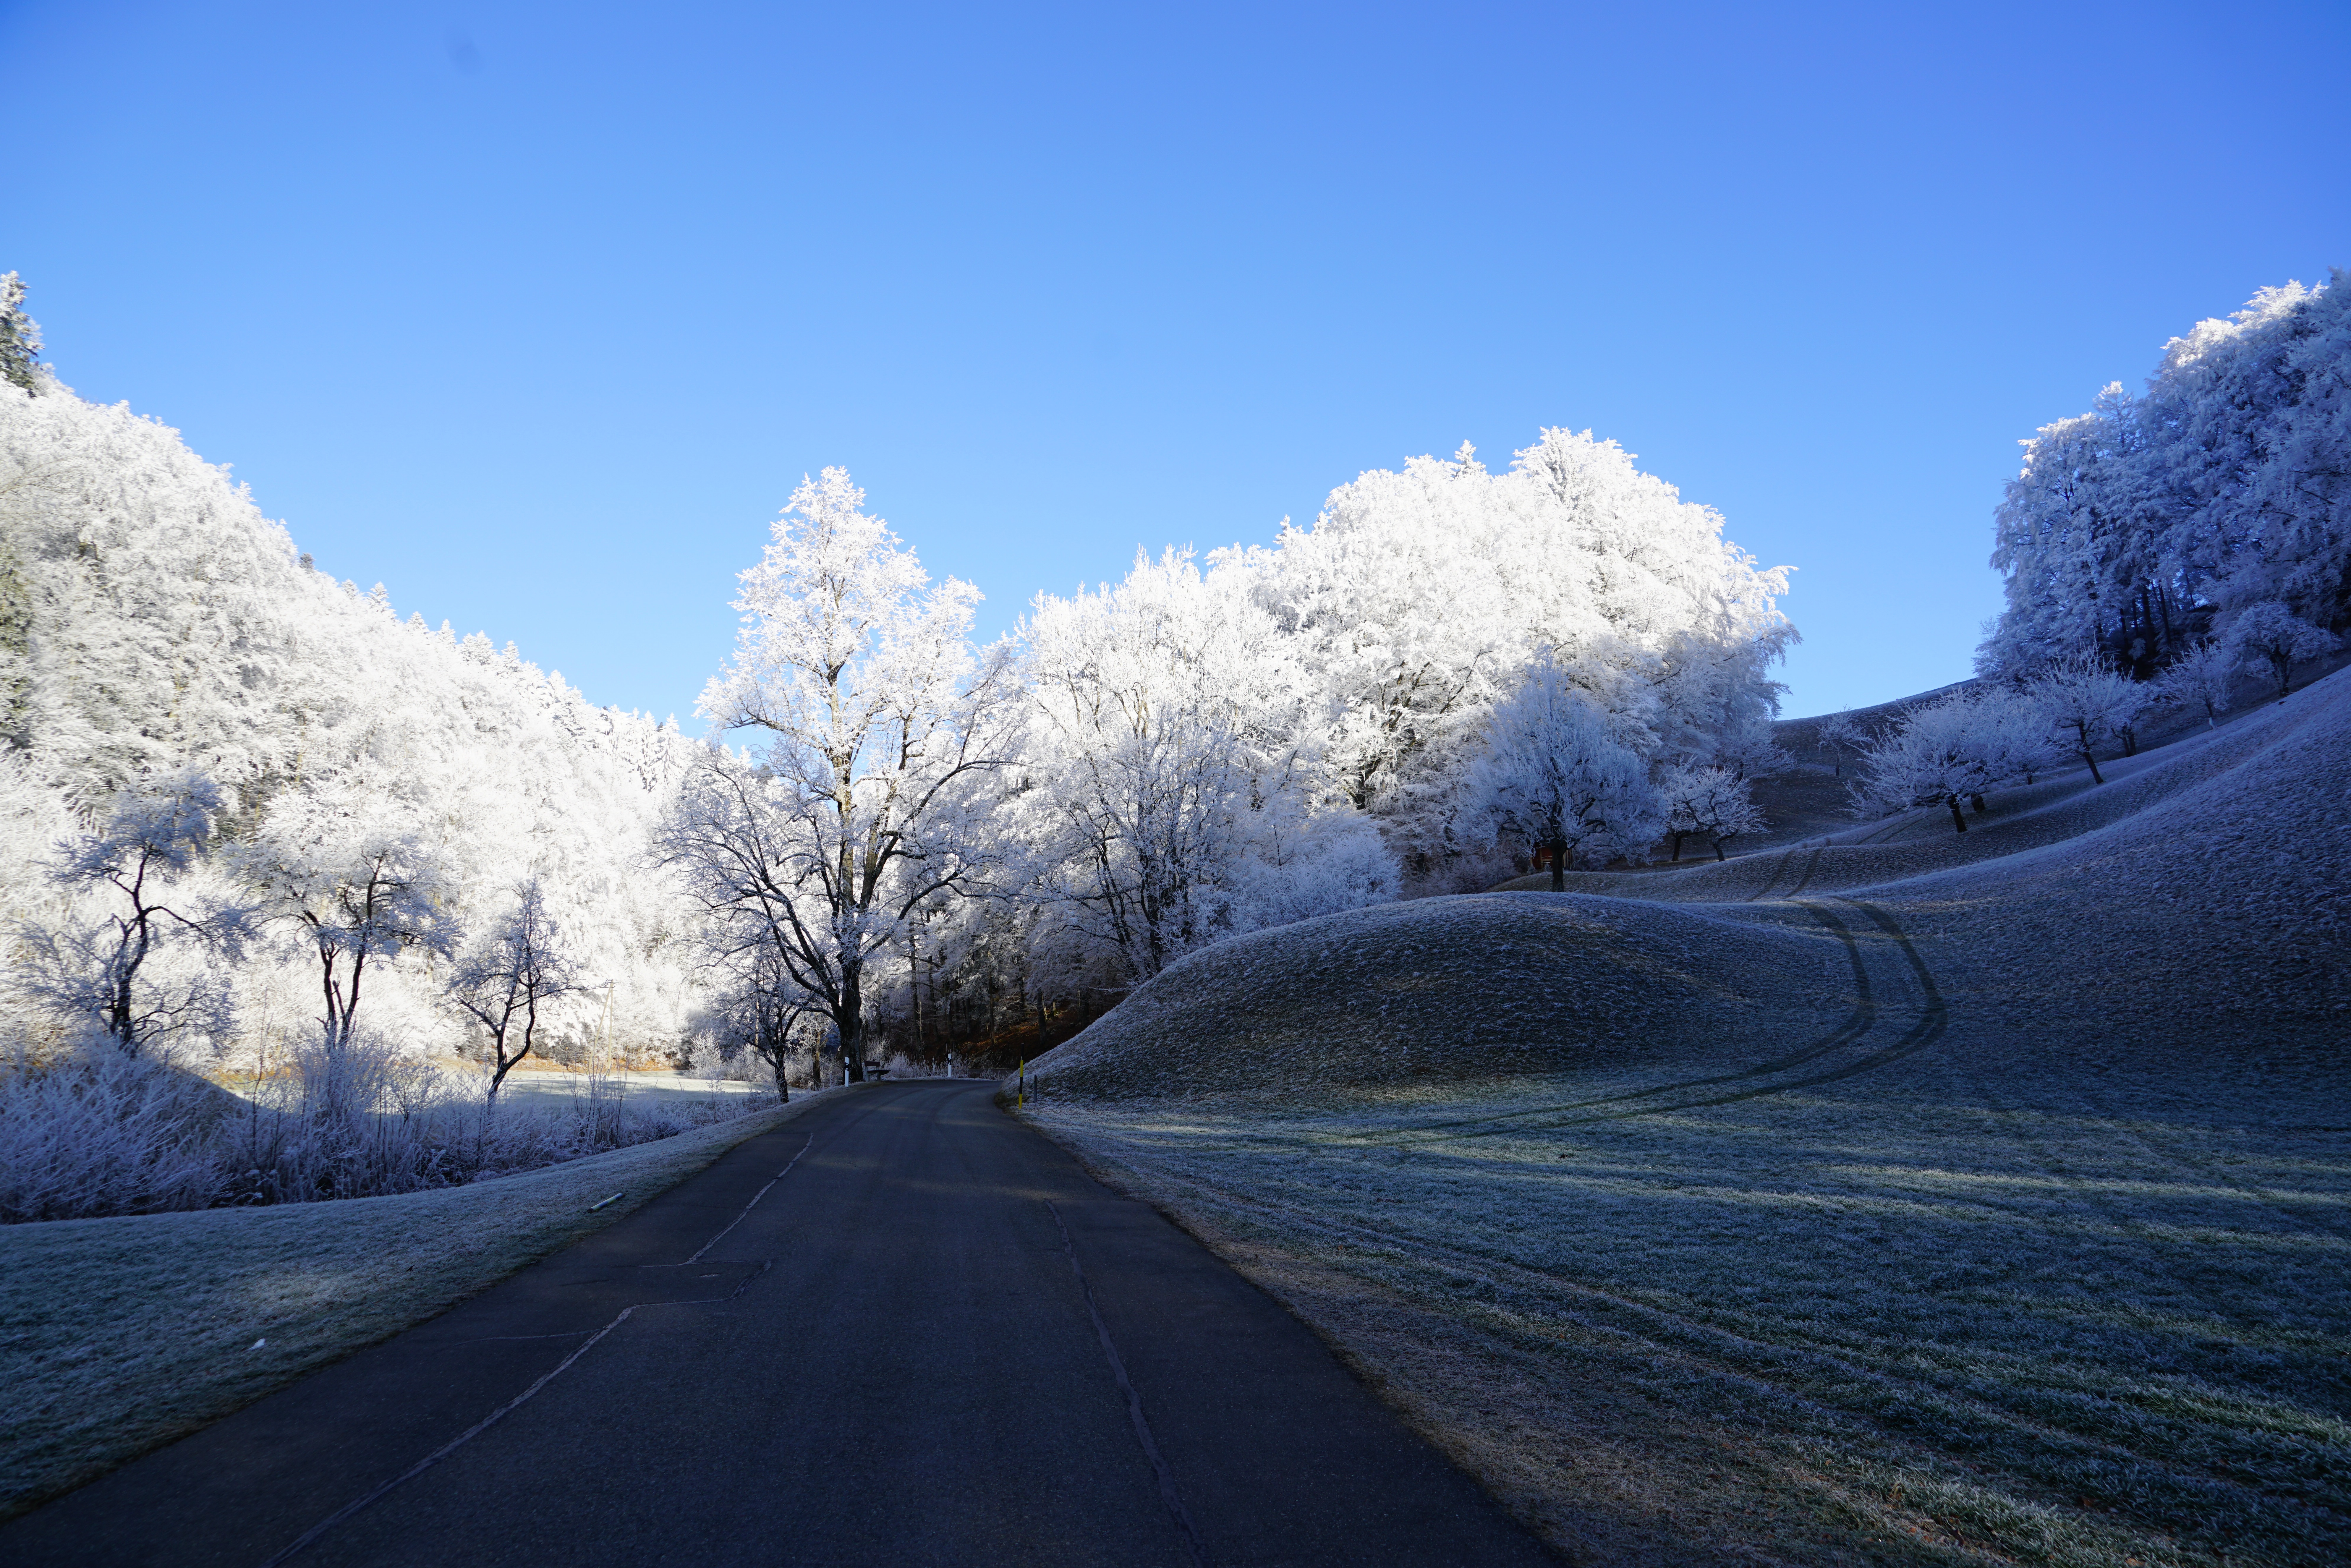 hill frost road trees 4k 1602606182 - Hill Frost Road Trees 4k - Hill Frost Road Trees 4k wallpapers